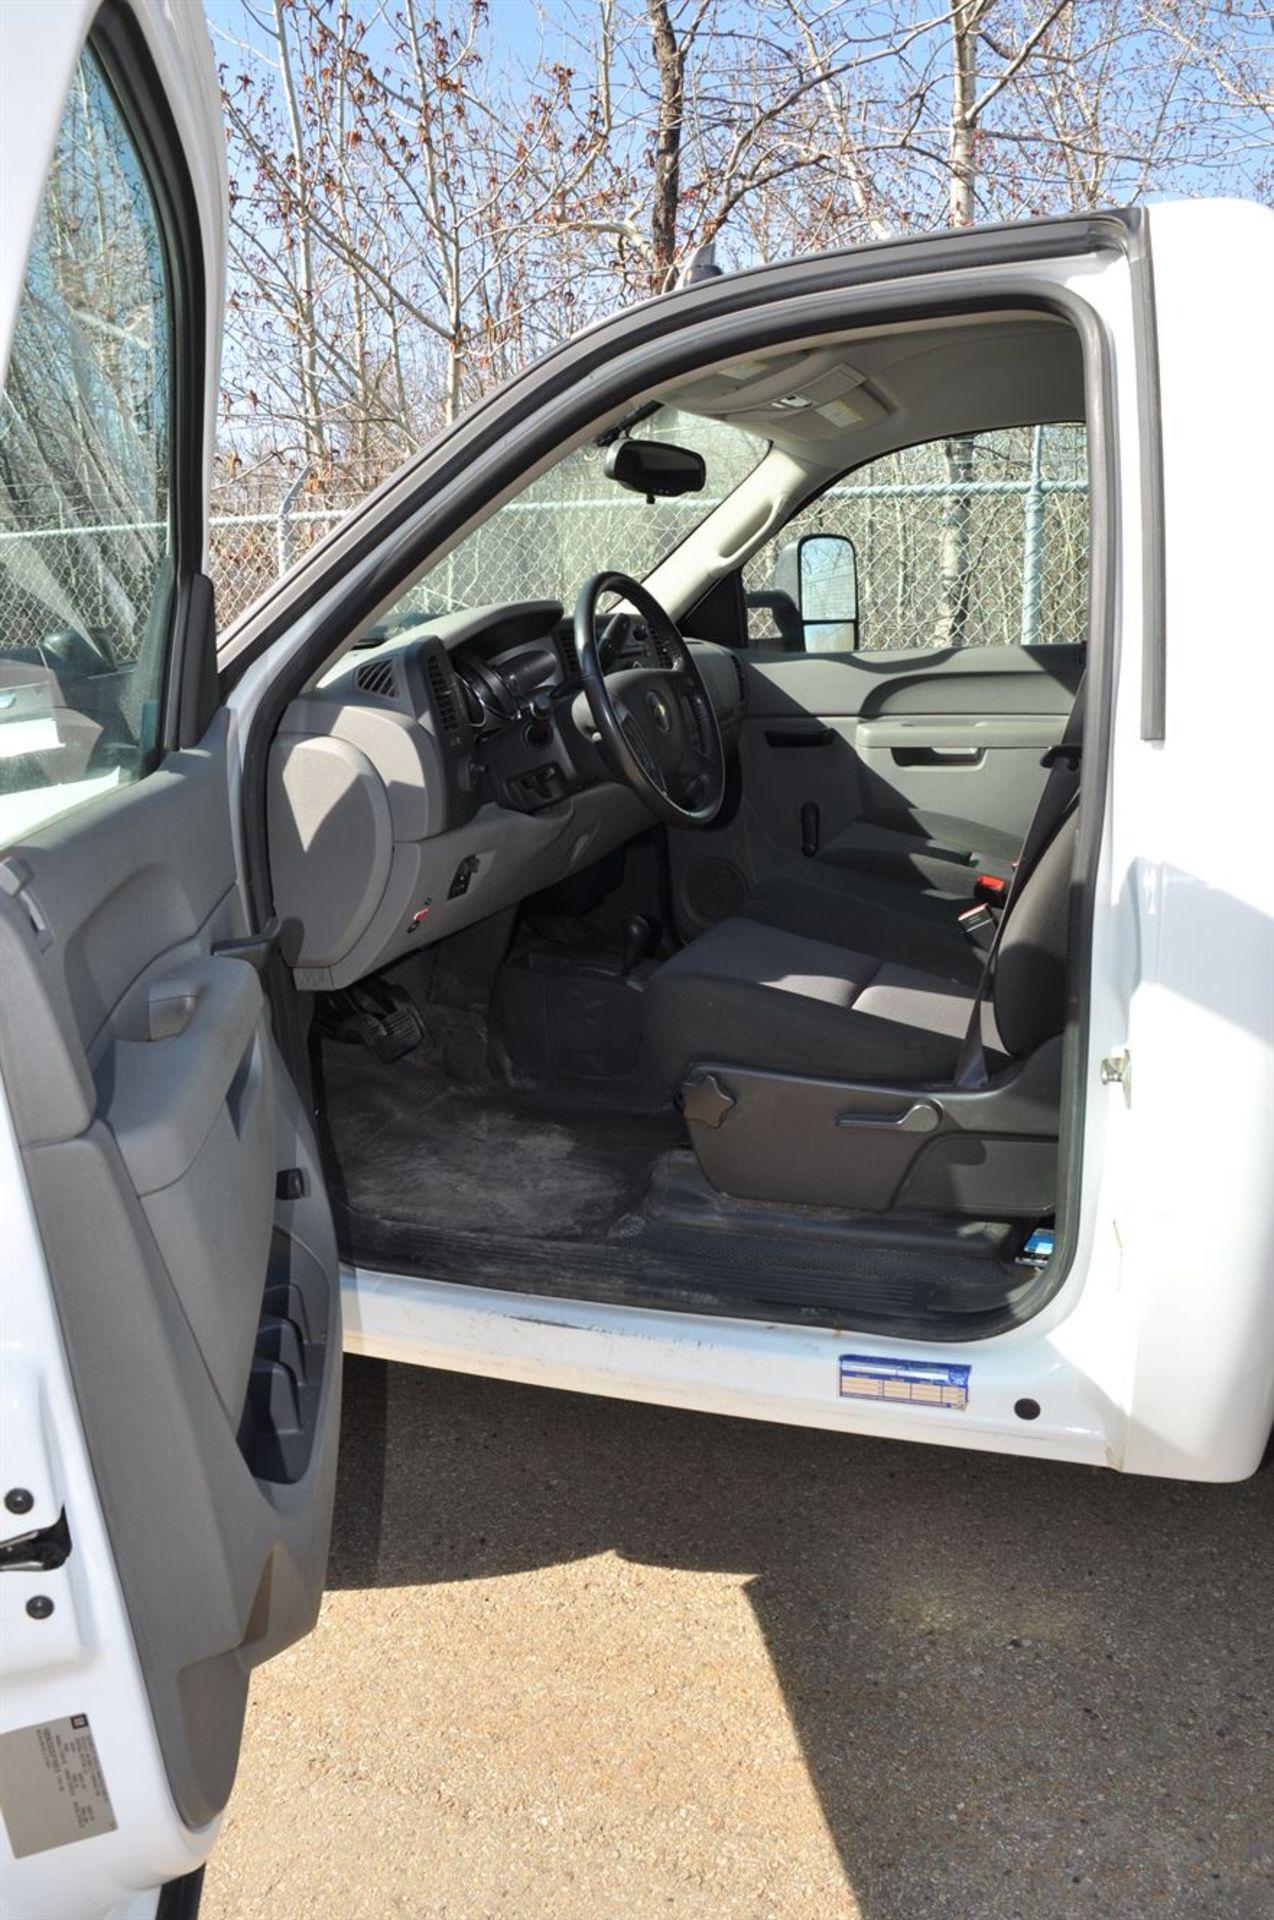 2012 CHEVROLET SILVERADO 3500 HD Flat Deck Dually Truck, VIN 1GB3KZCGXCF155813, w/ VORTEX Engine, - Image 6 of 9